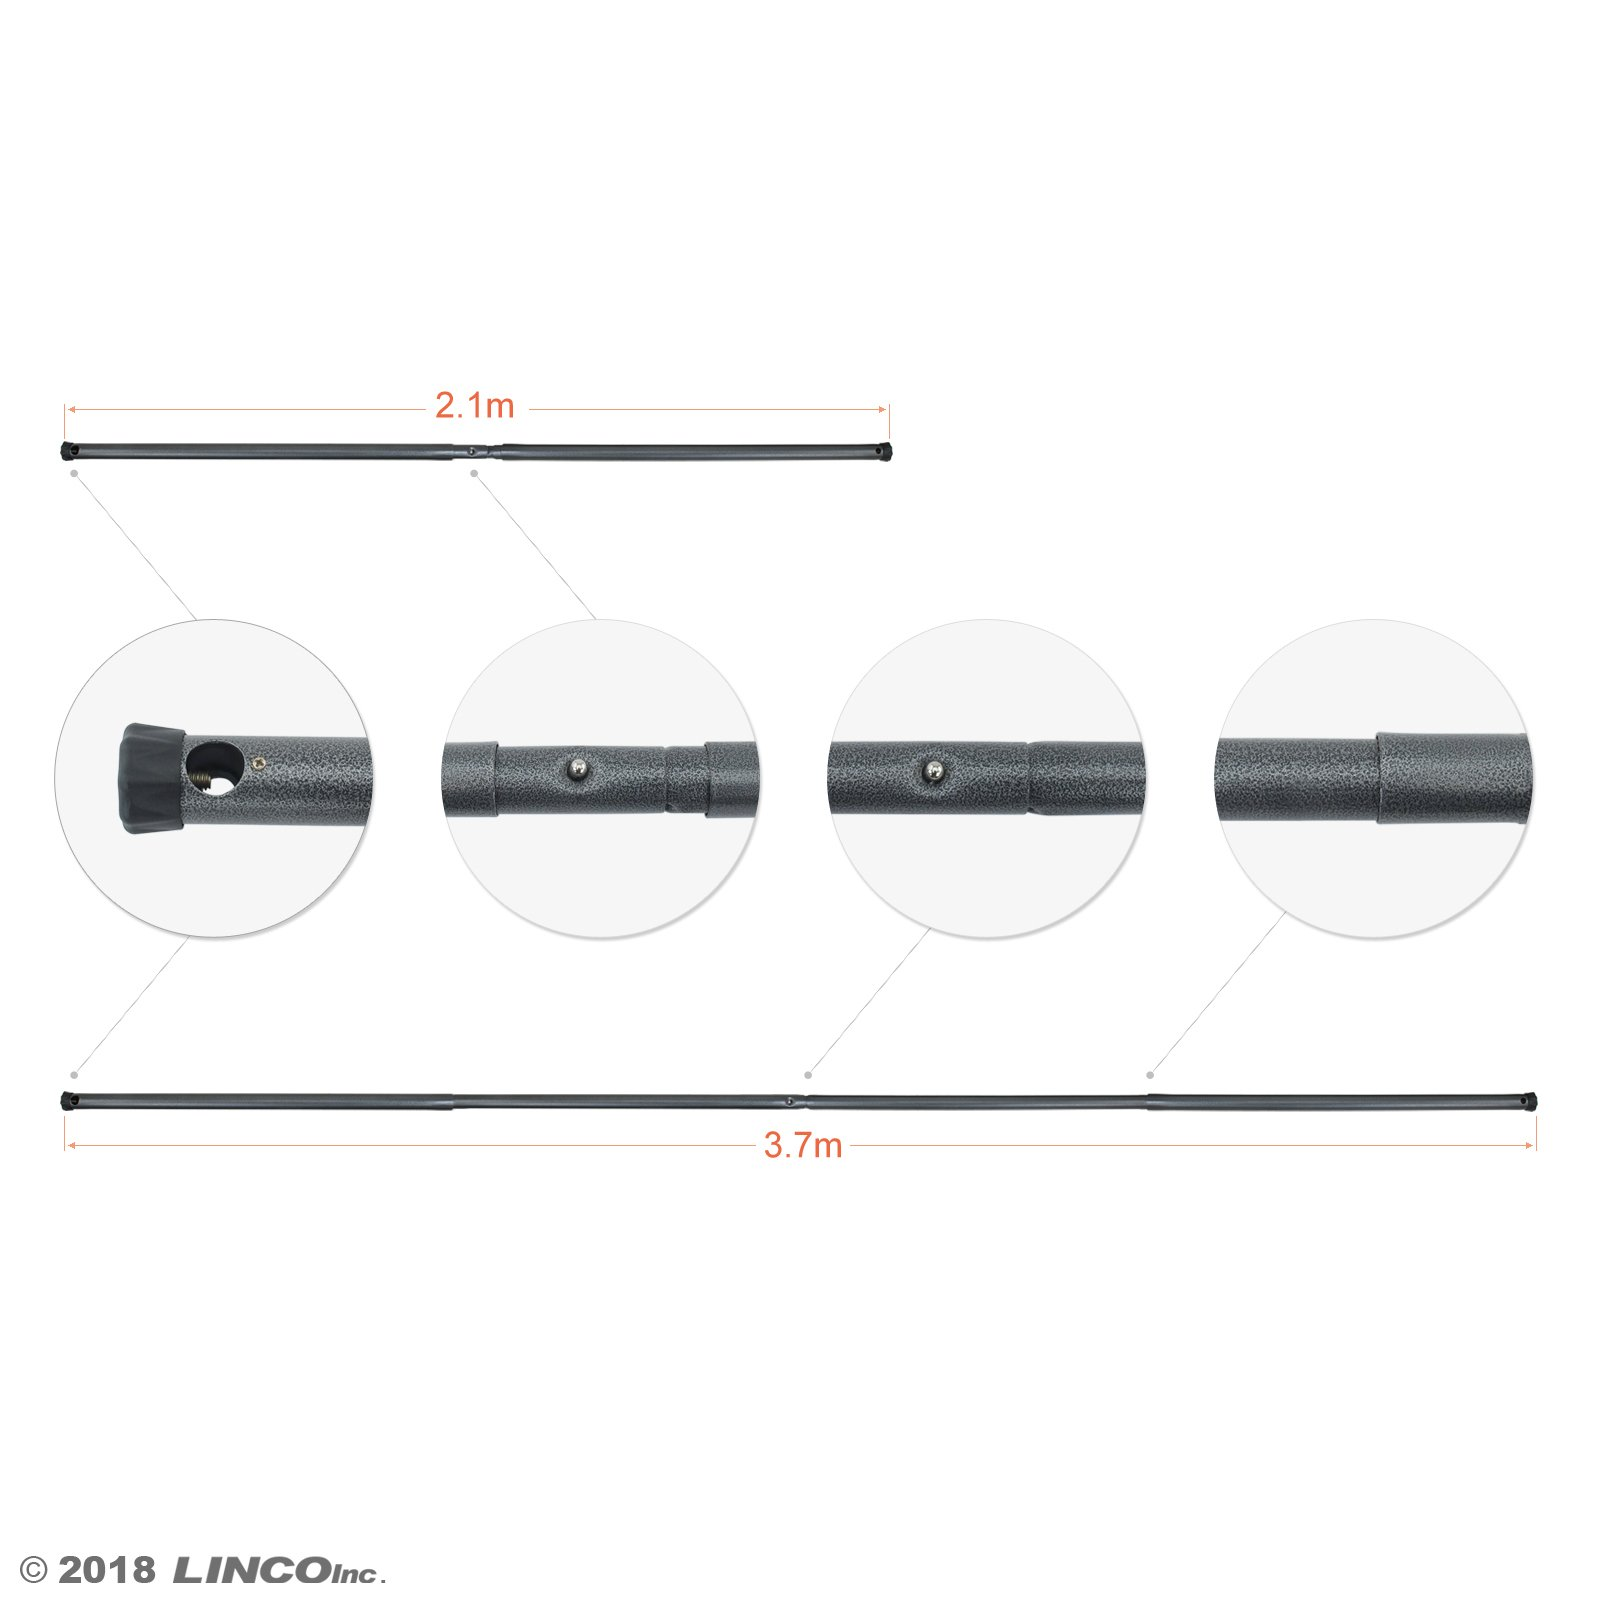 LINCO Lincostore Studio Crossbar for Backdrop Stands, 12.5 feet, Telescopic AM237